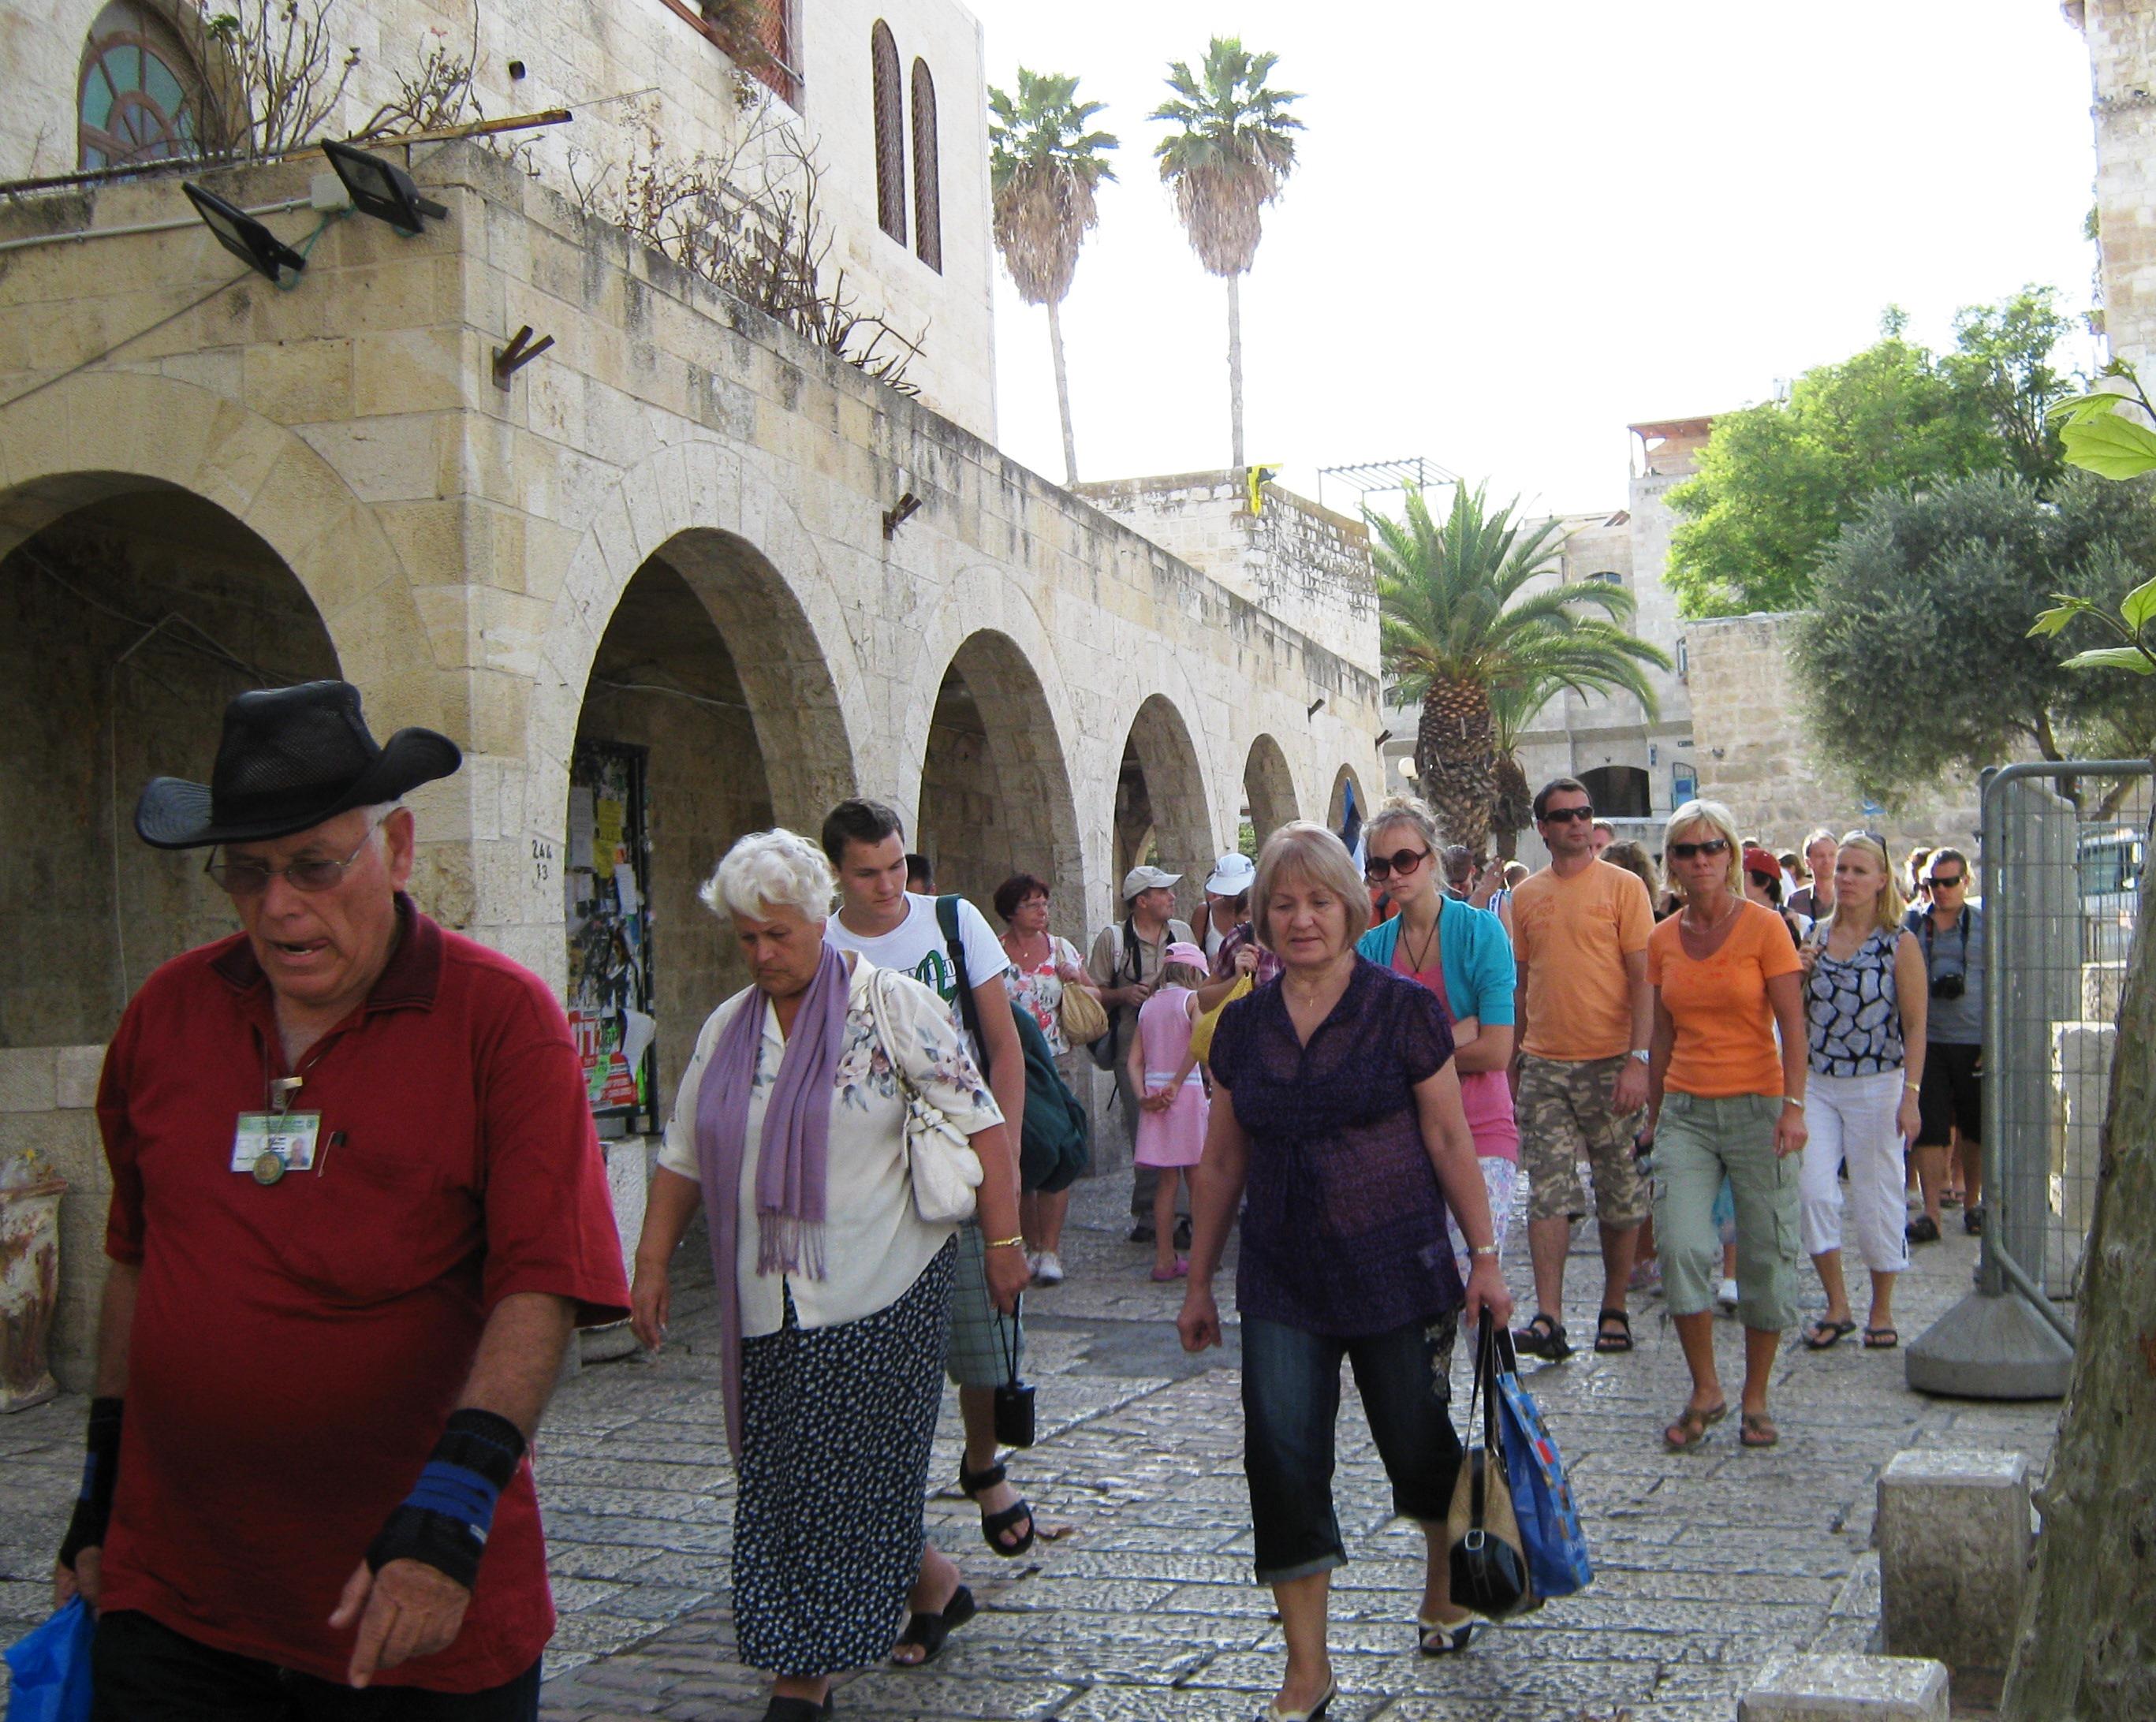 Old City tourism